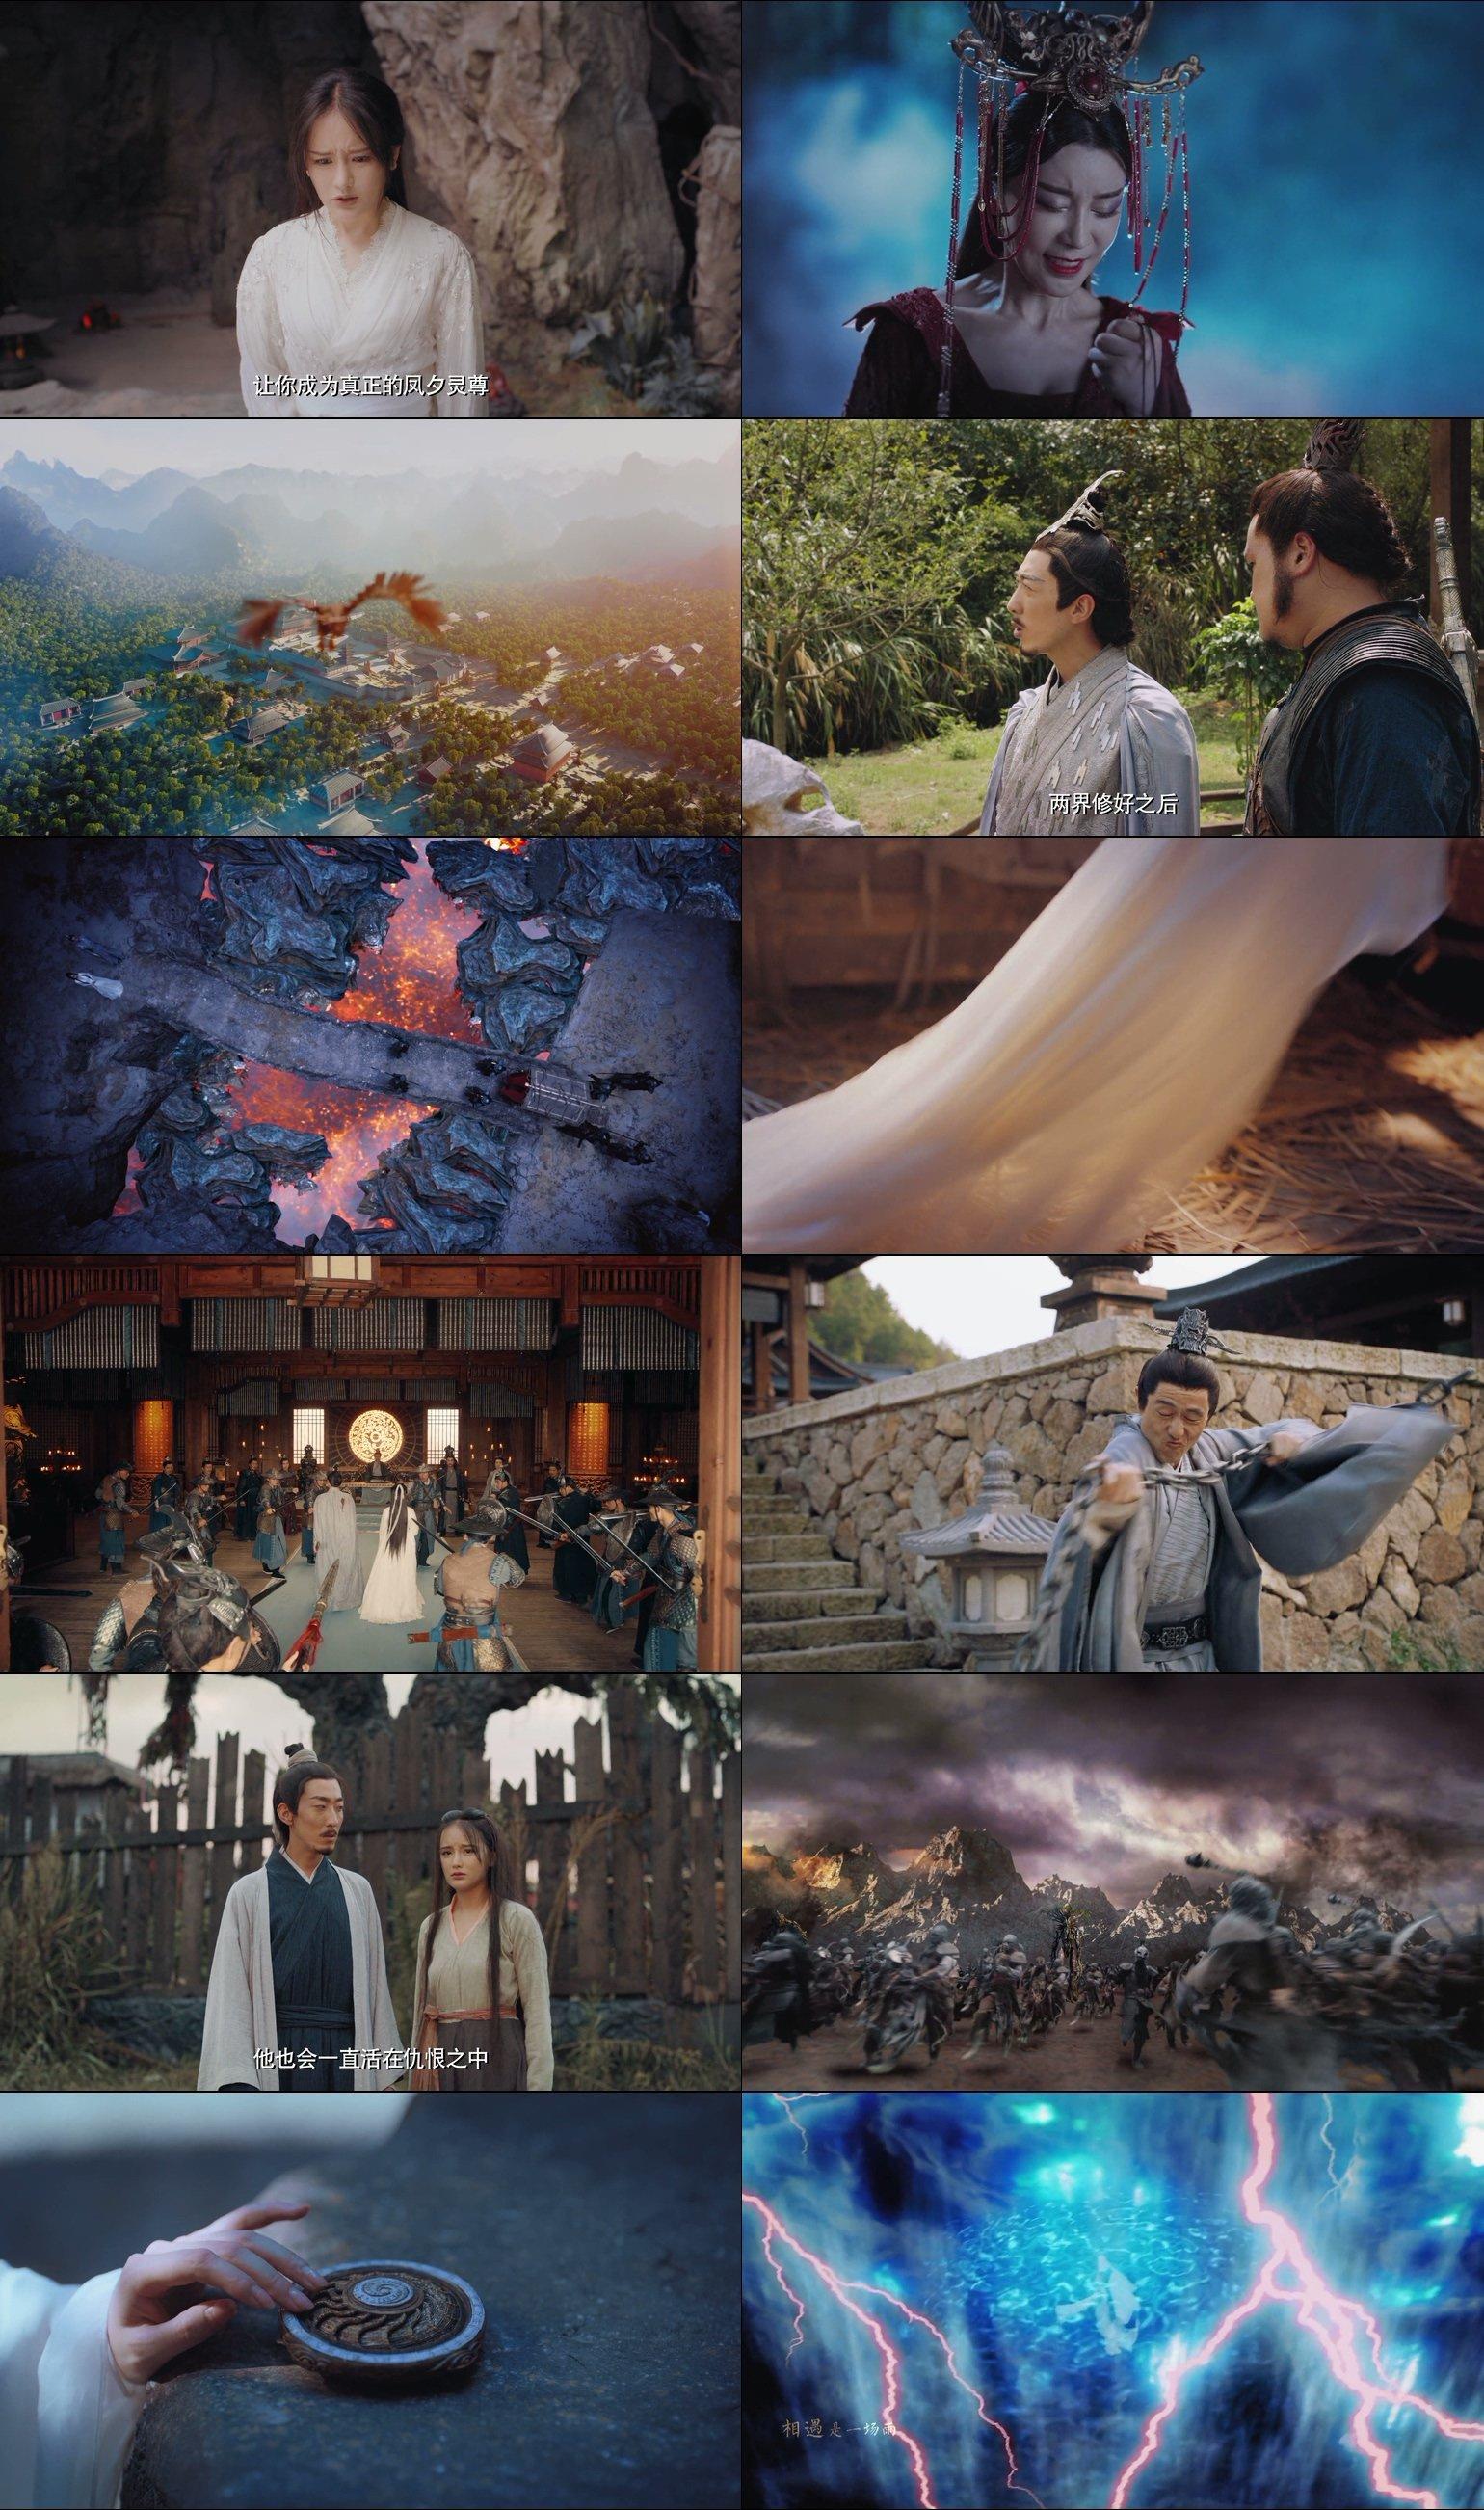 [x3]為父進行式|倩女仙緣2|黑白世界.WEB-DL.1080p[繁簡英]